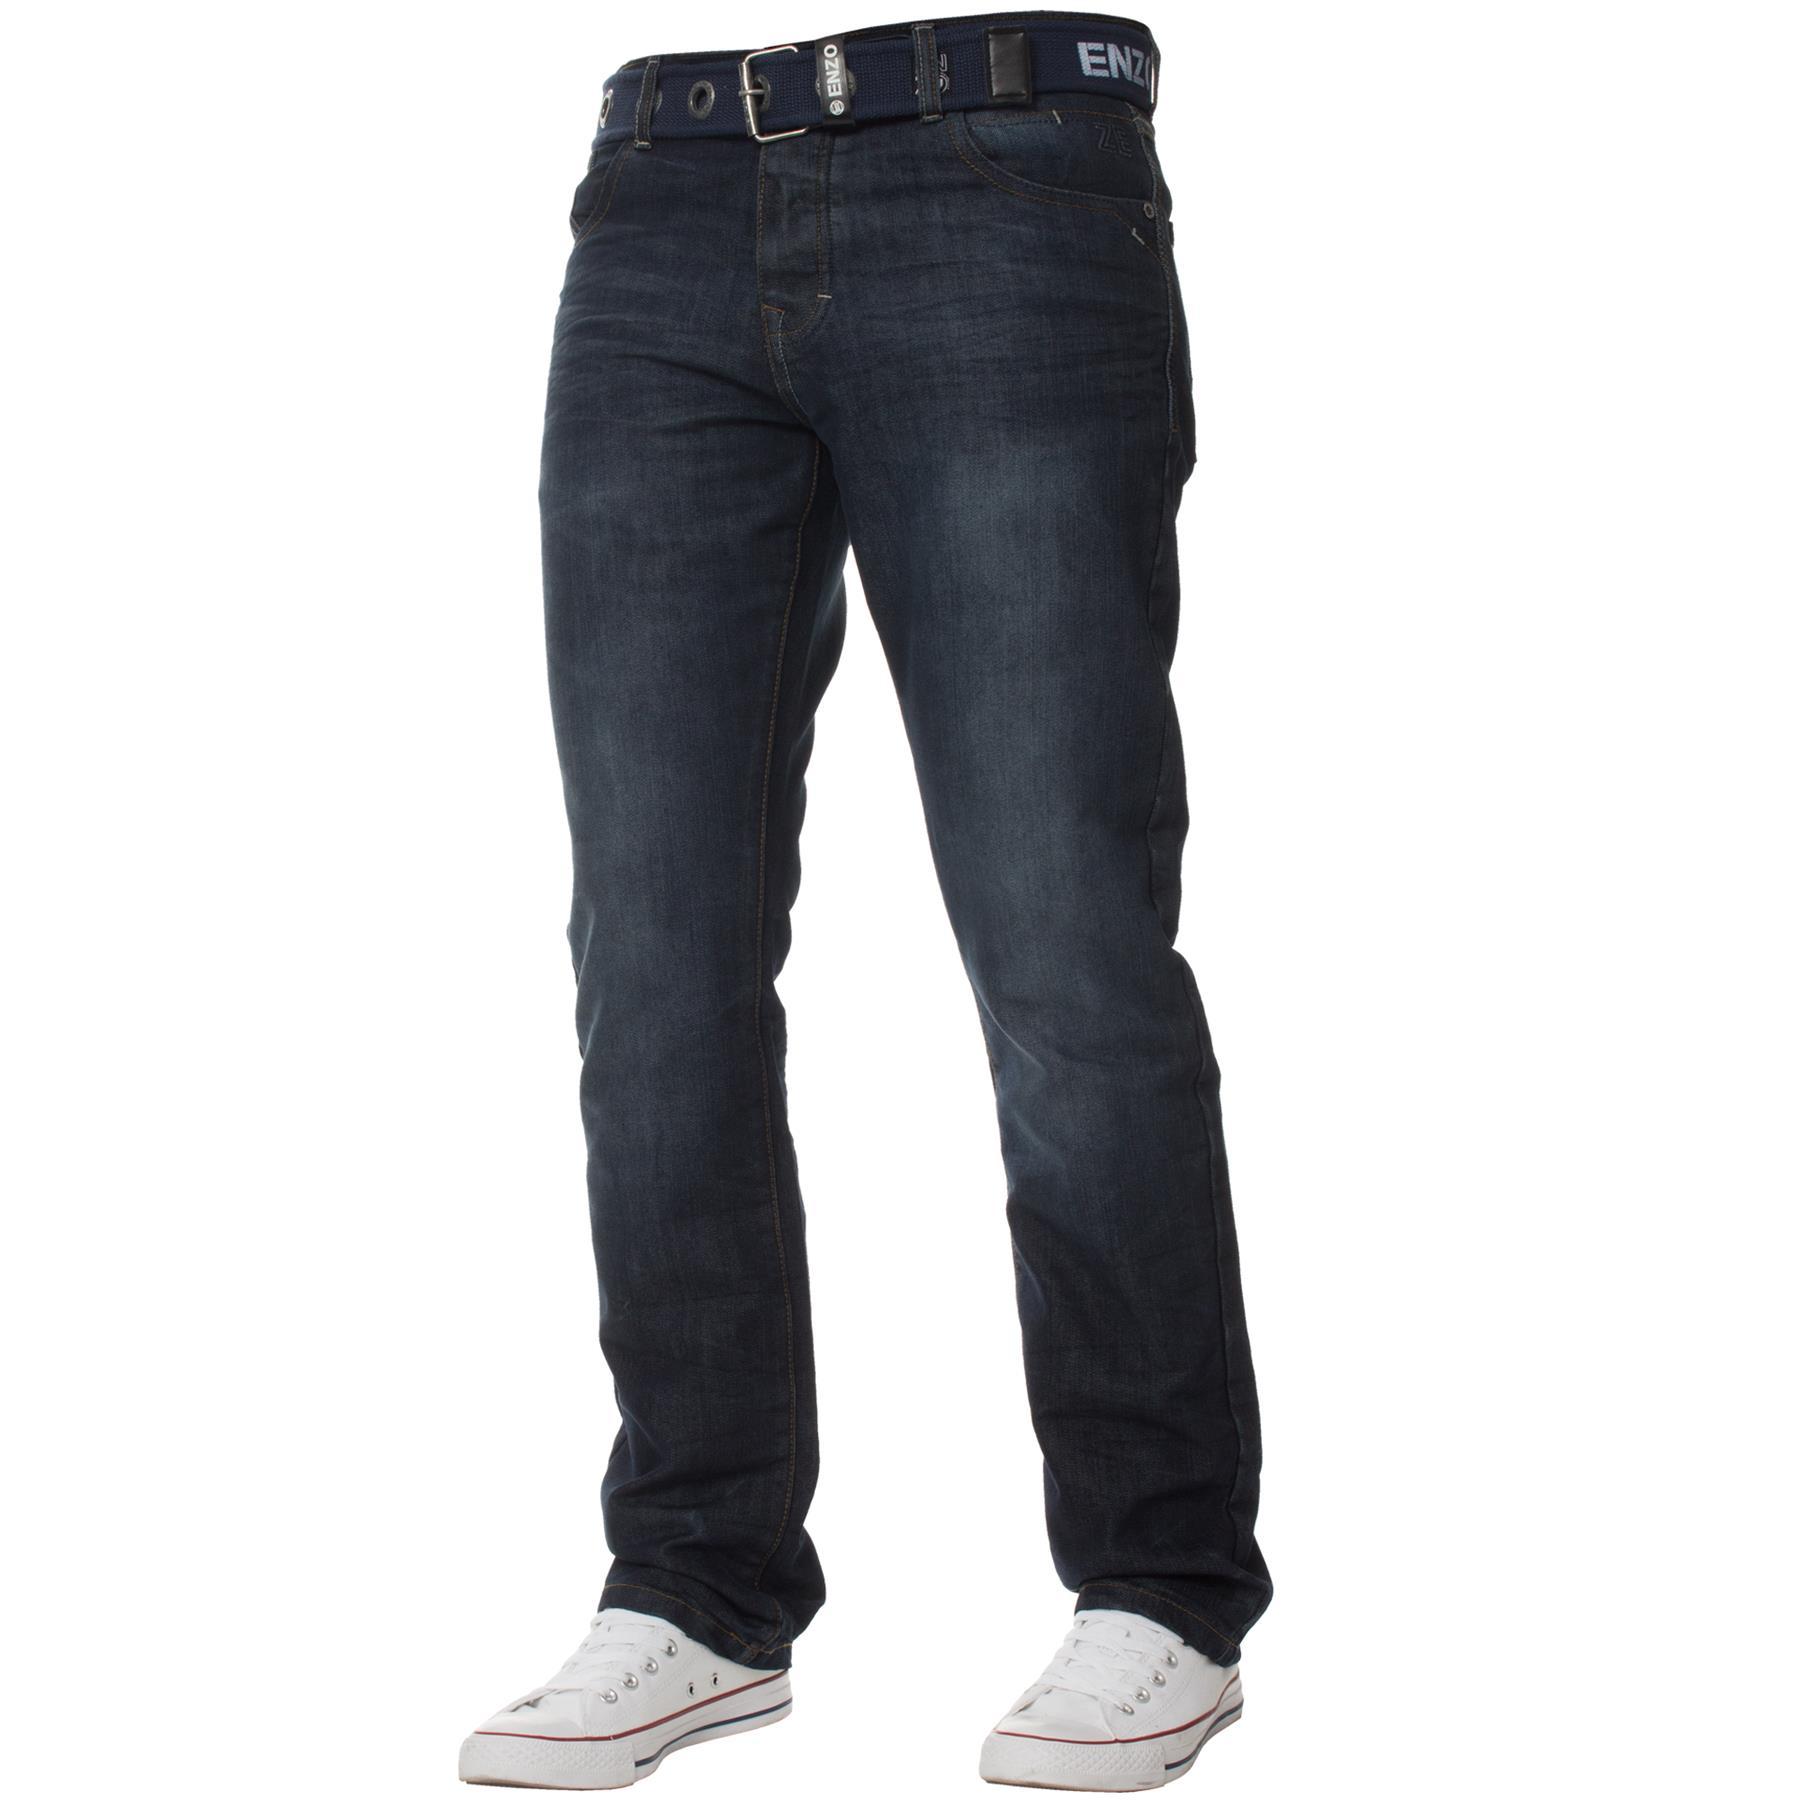 ENZO-Jeans-para-hombre-Big-Alto-Pierna-King-Size-Jeans-Pantalones-Chino-Pantalones-Pantalones-44-034 miniatura 80